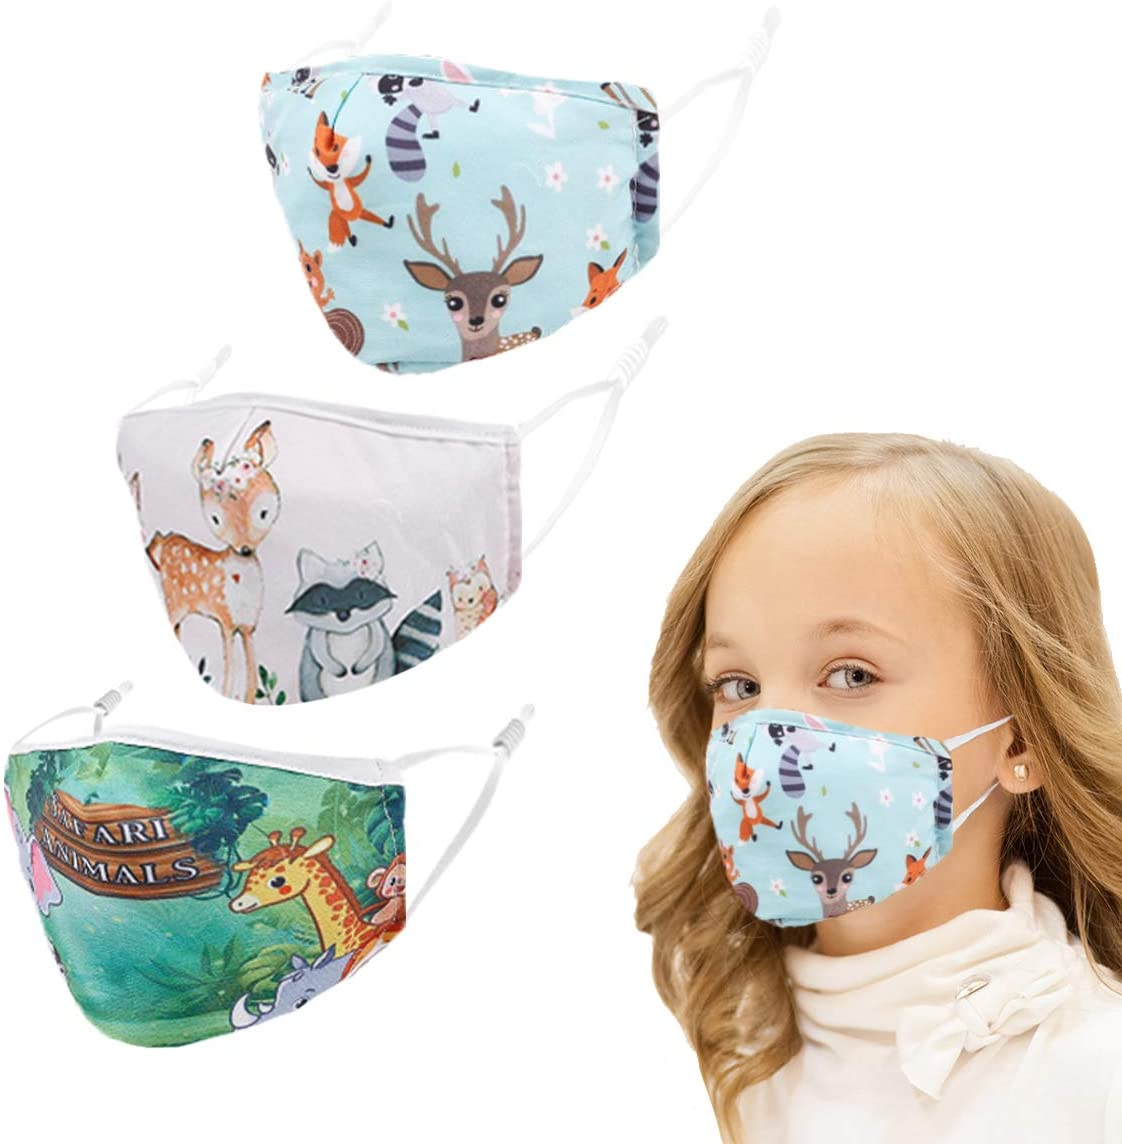 Woplagyreat 3 Pcs Face Cloth Masks for Kids, Comfortable Protective Cute Masks, Reusable & Washable